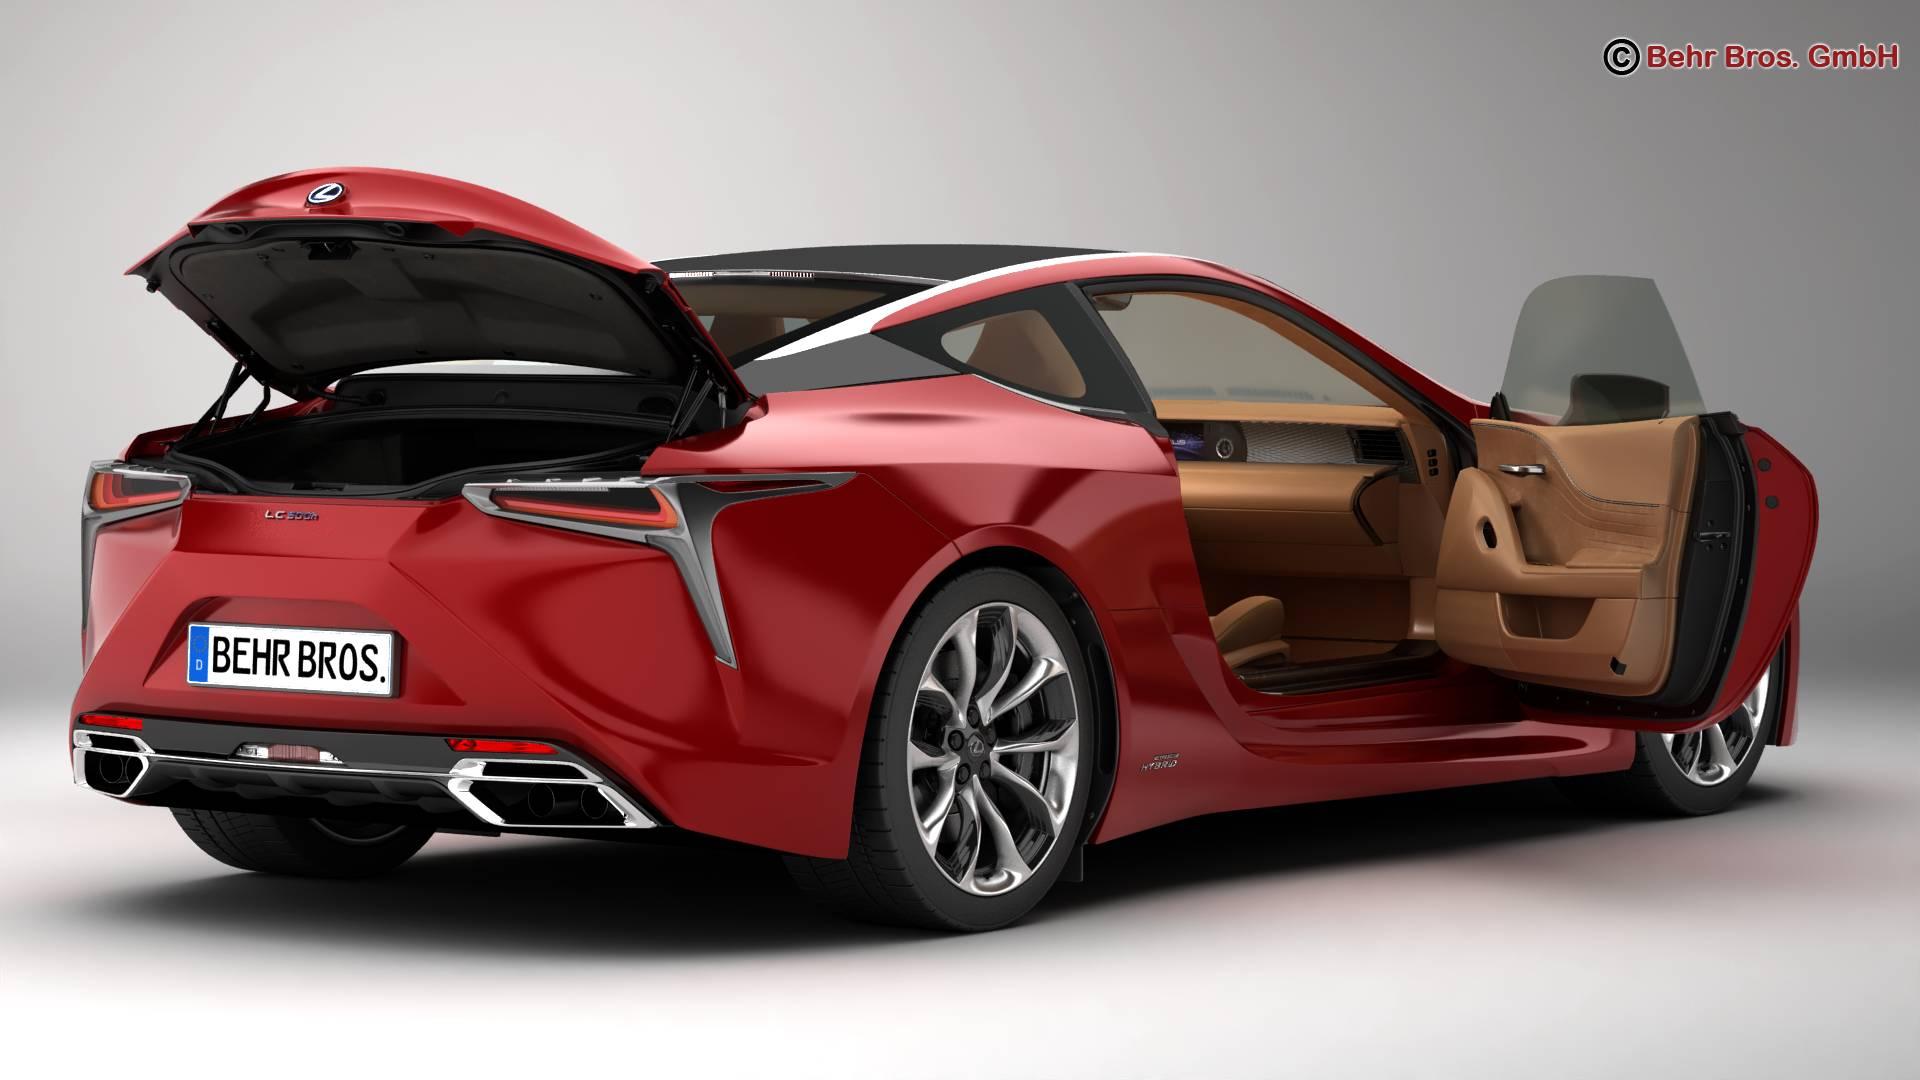 lexus lc 500 us hybrid 2018 3d model 3ds max fbx c4d lwo ma mb obj 267929